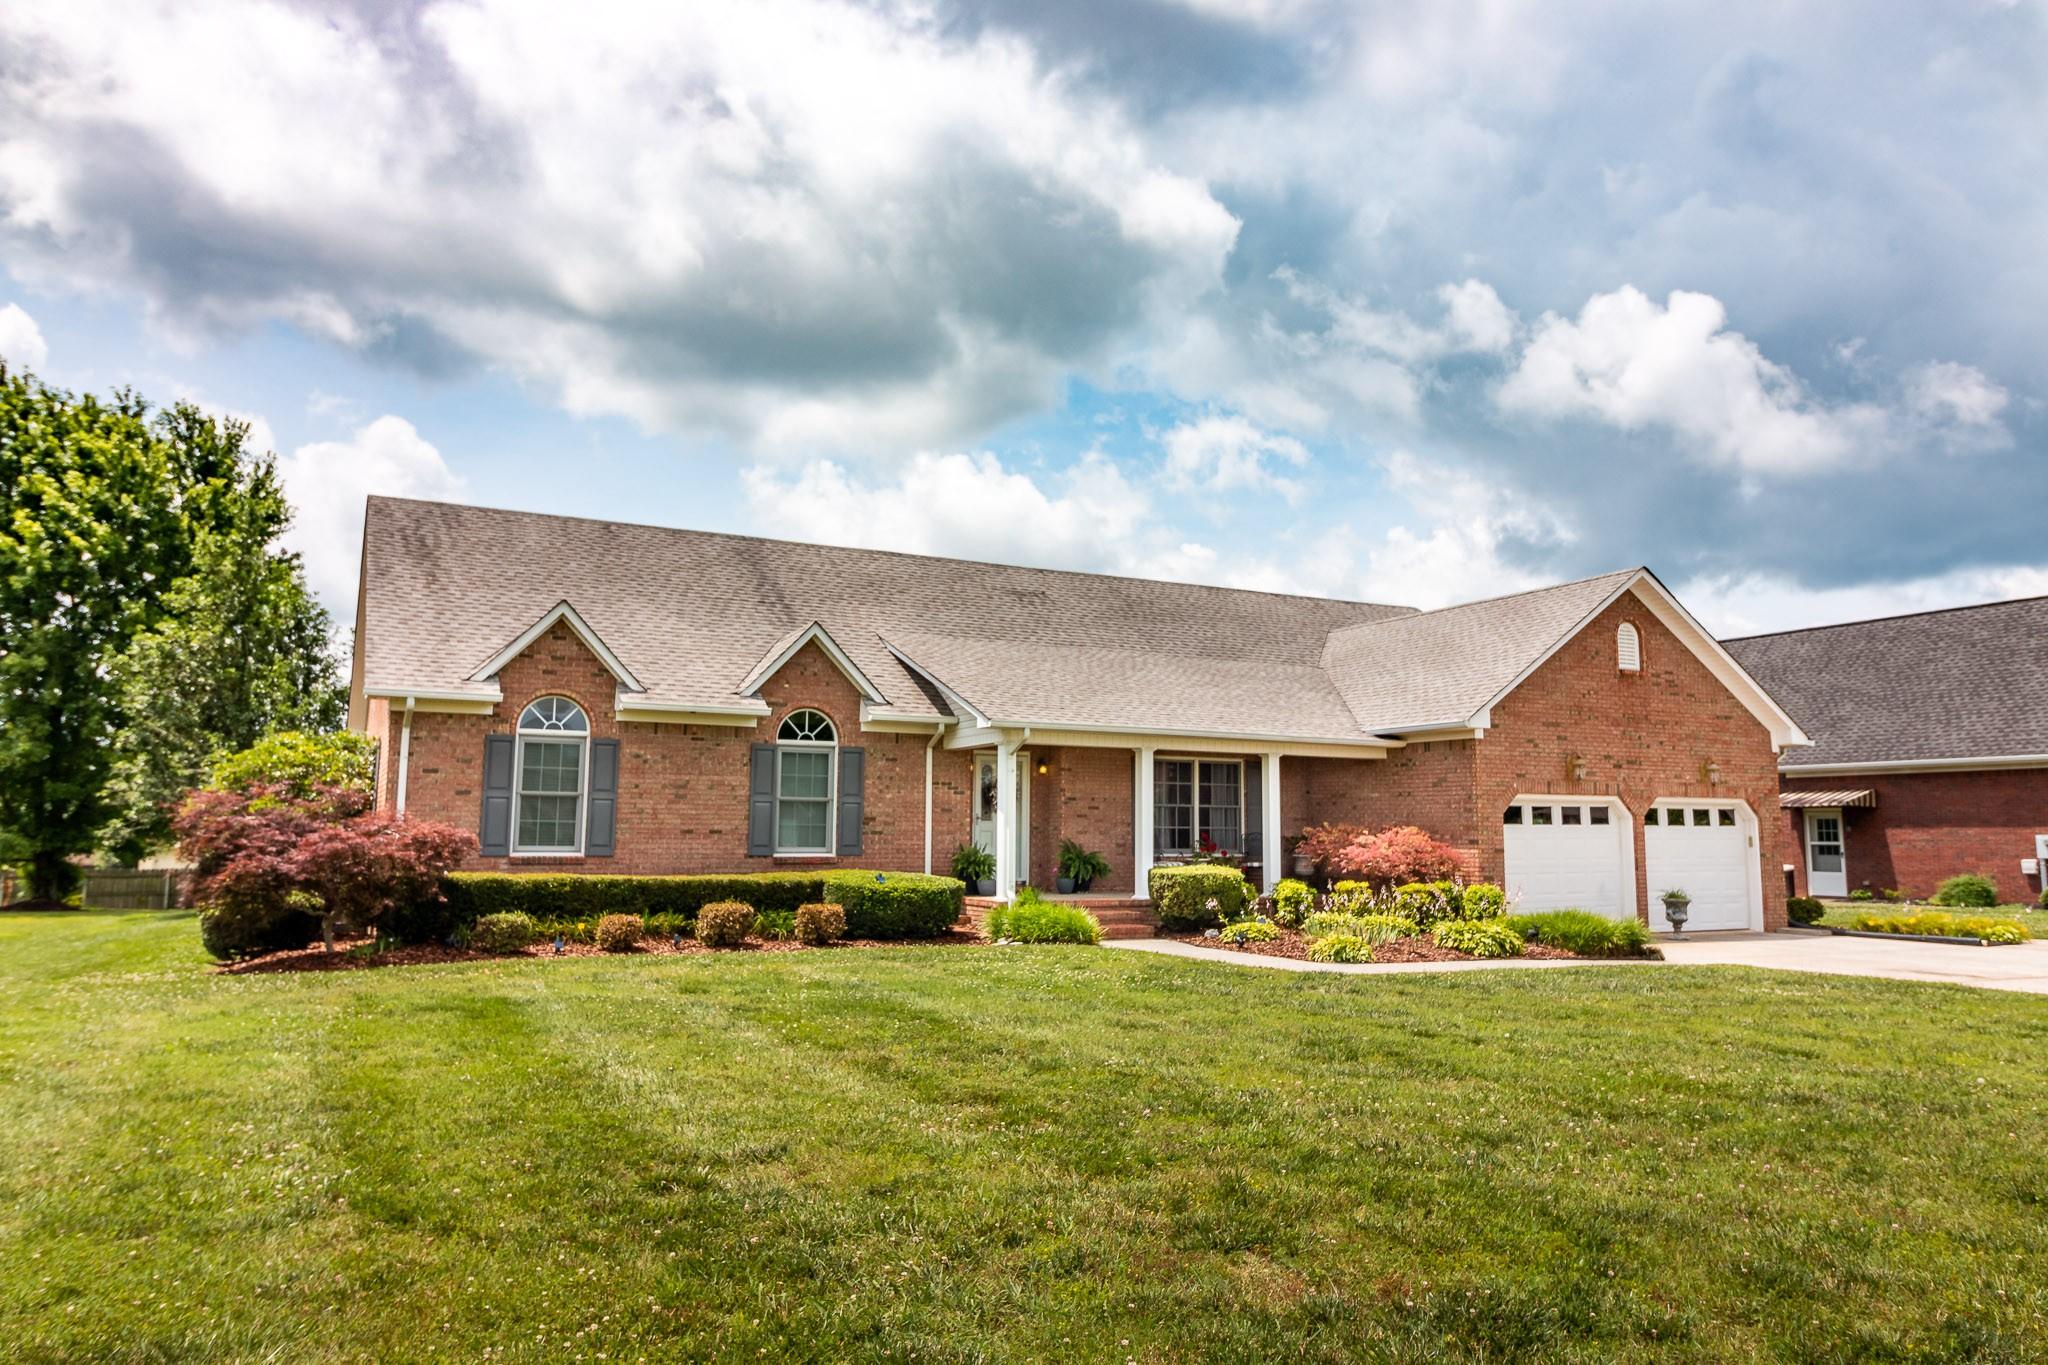 703 Toben Ter Property Photo - Lawrenceburg, TN real estate listing